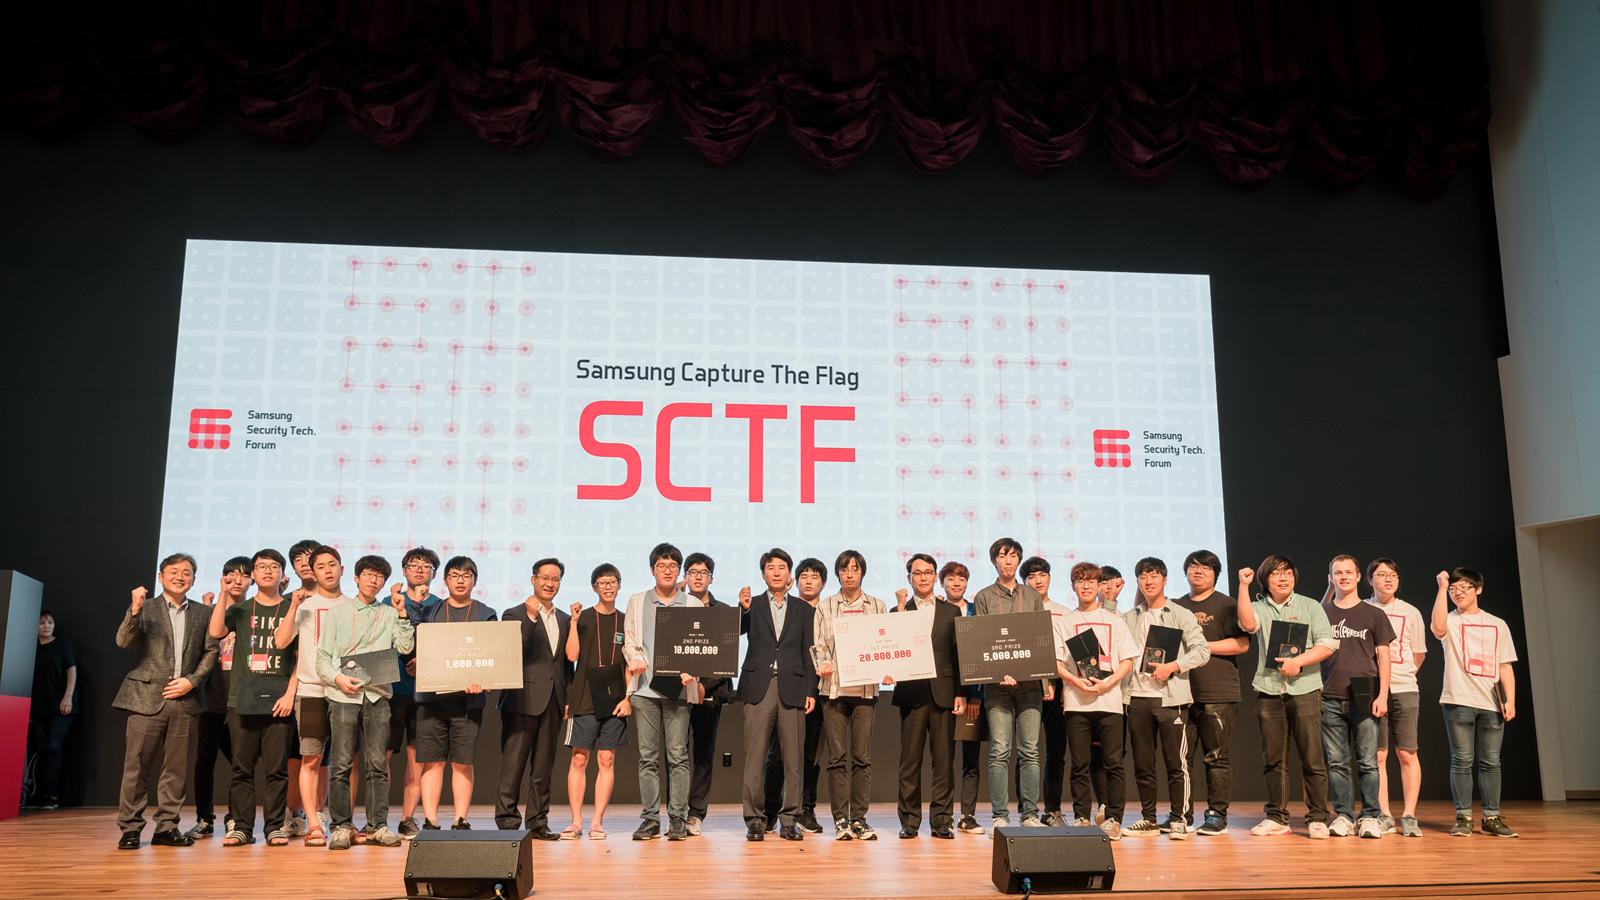 SSTF 2017